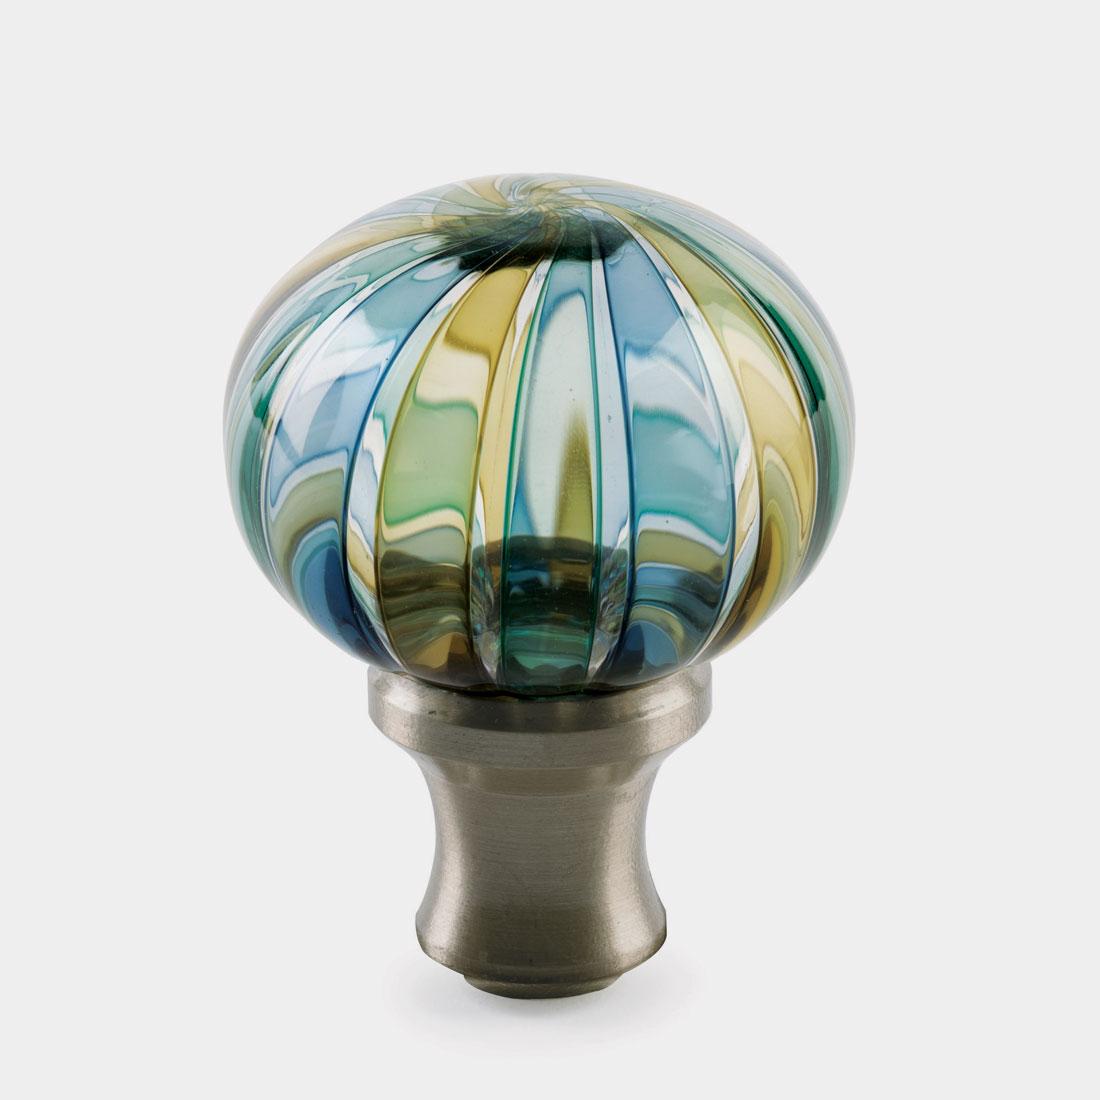 glass globe door knob photo - 2